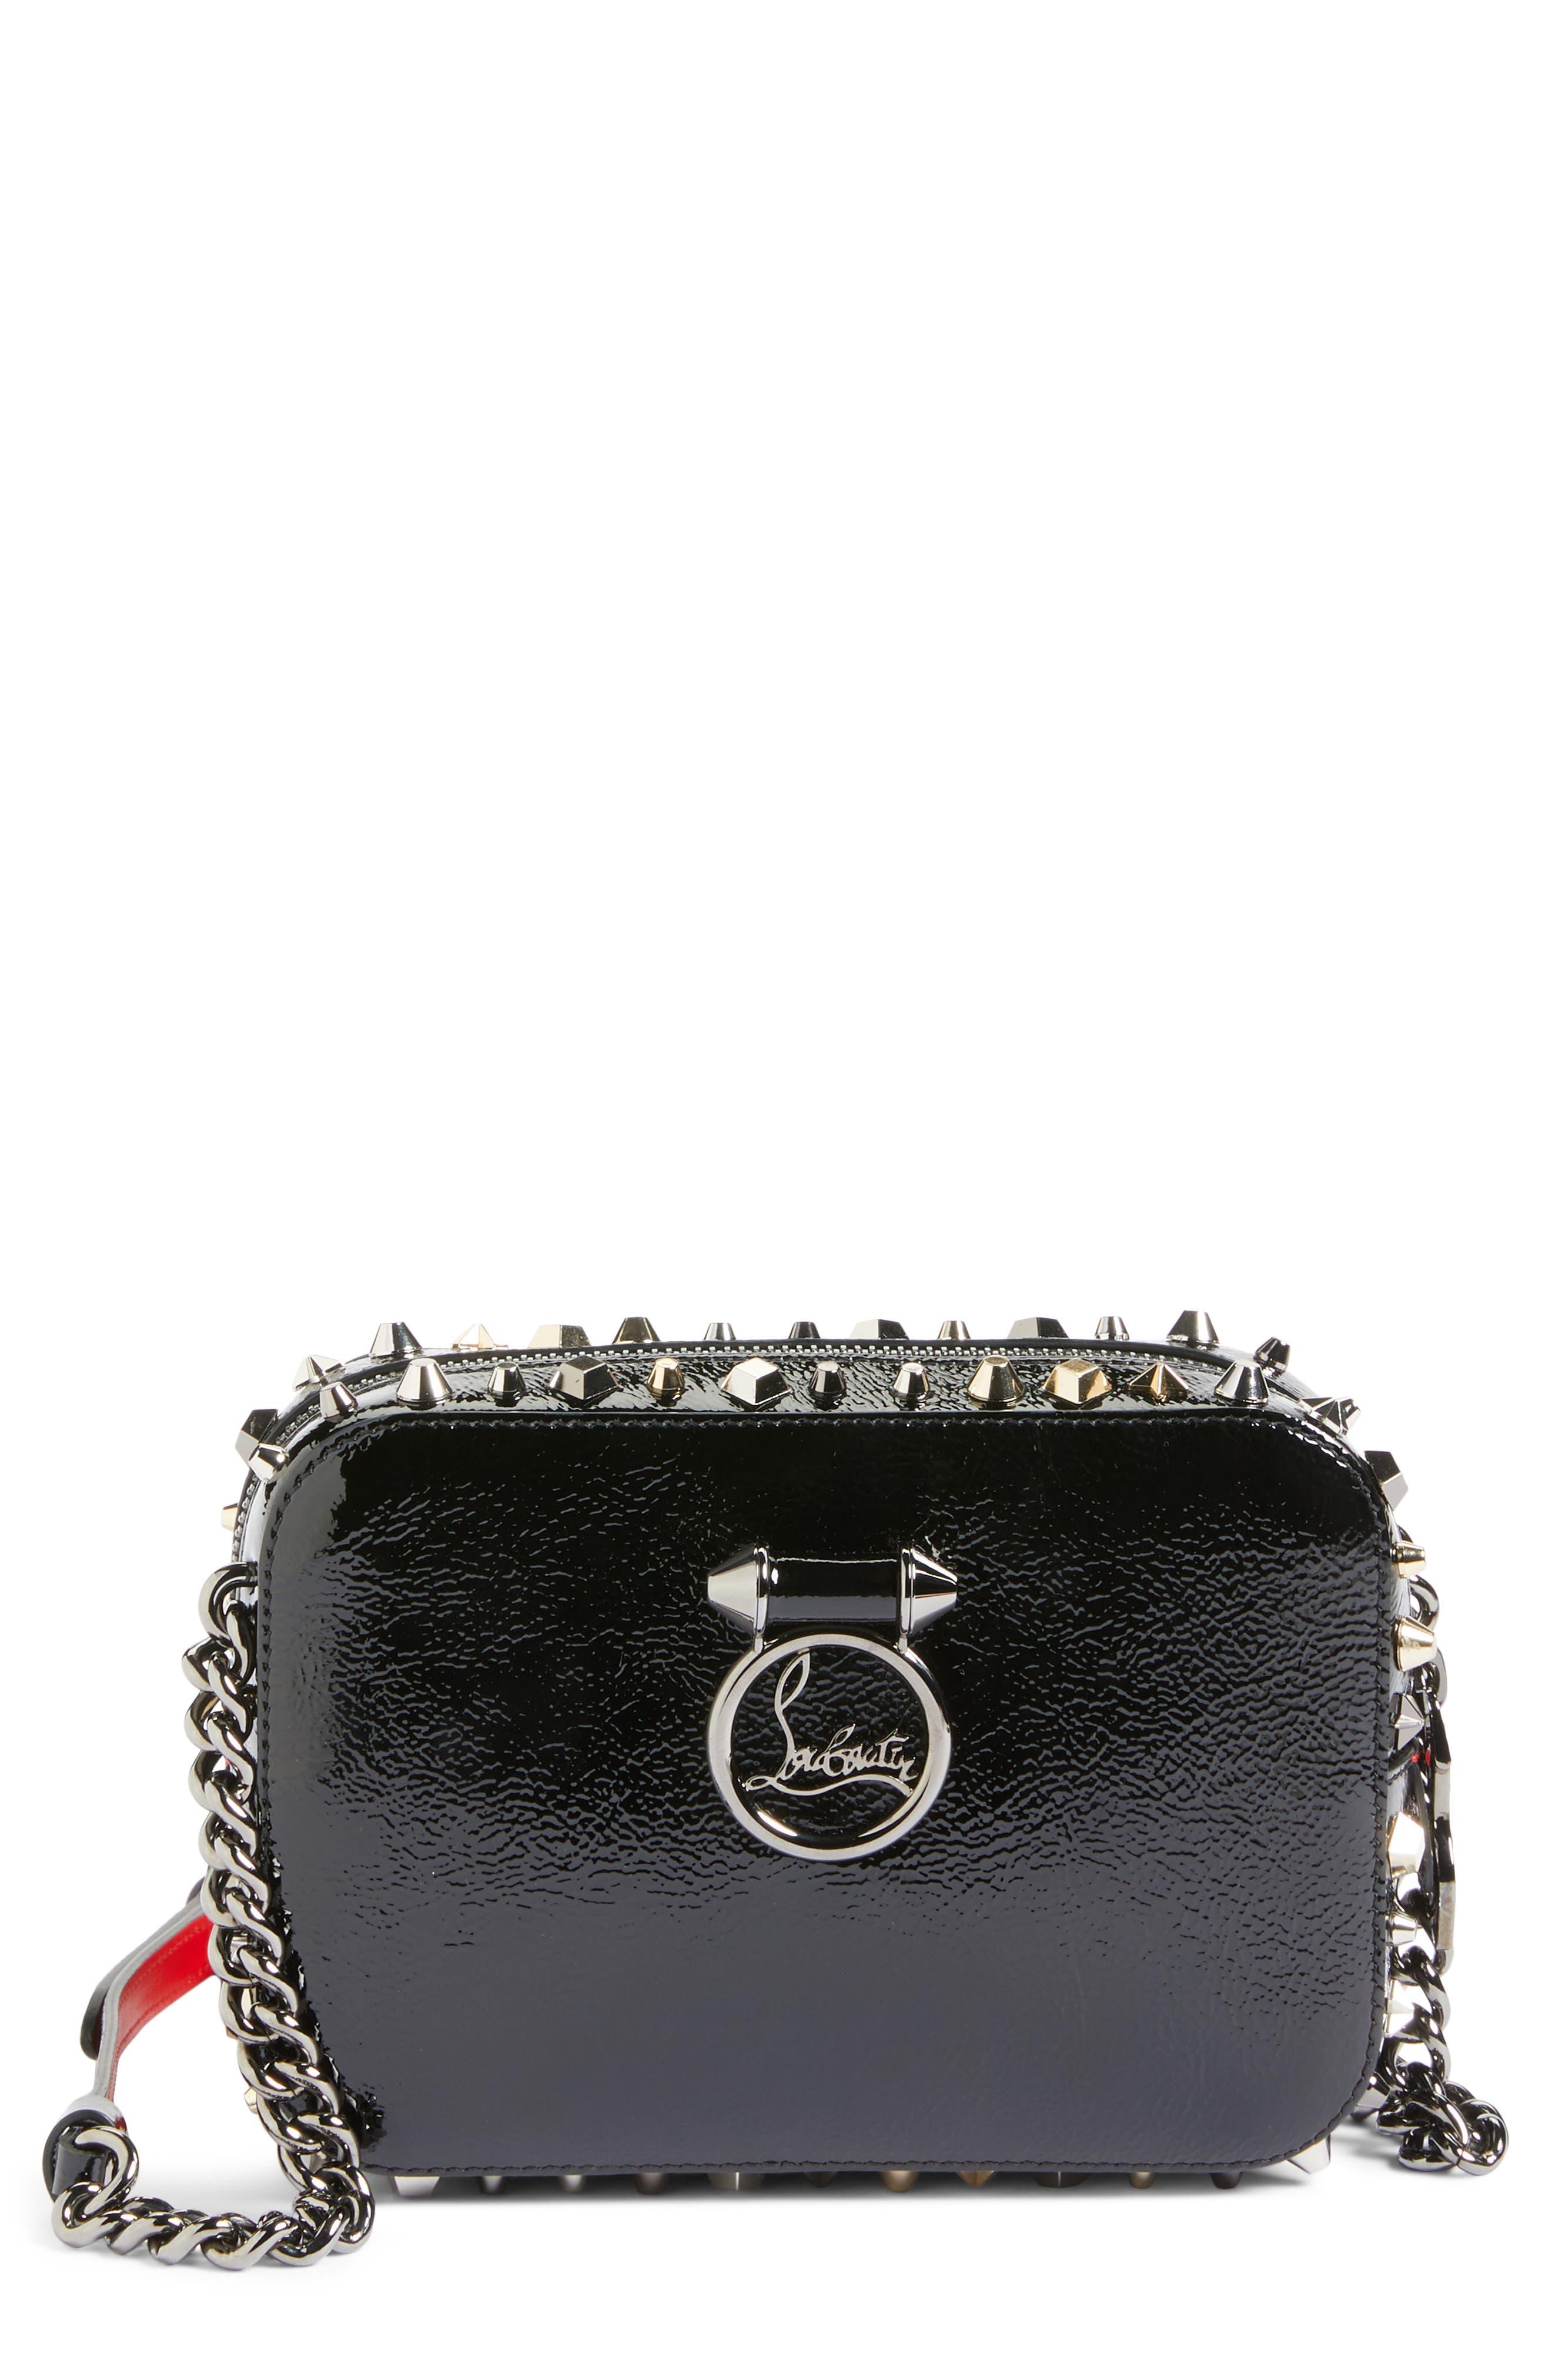 Alternate Image 1 Selected - Christian Louboutin Mini Rubylou Patent Leather Crossbody Bag